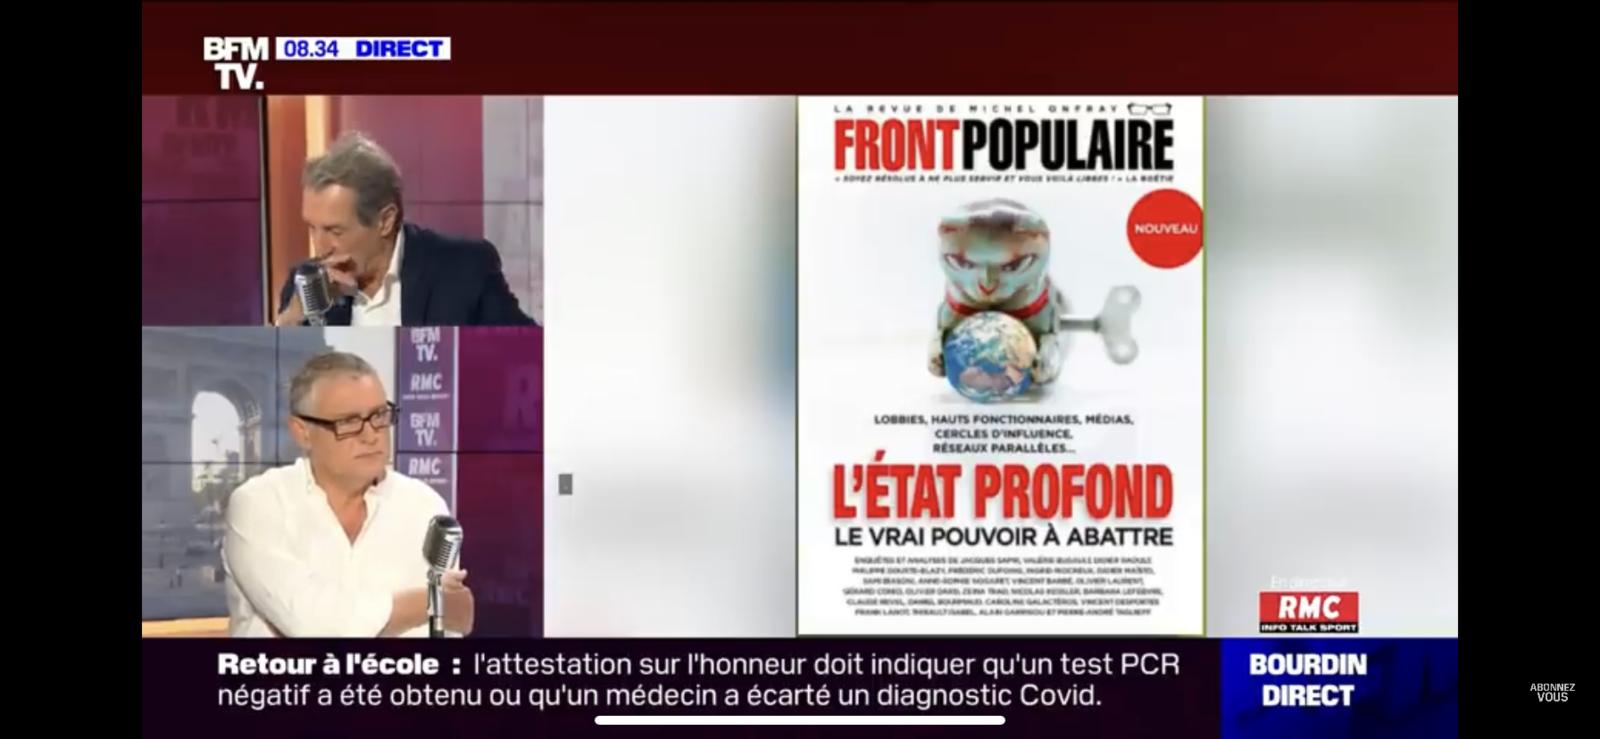 Michel Onfray - Bourdin Direct (BFMTV RMC) - 16.09.2020